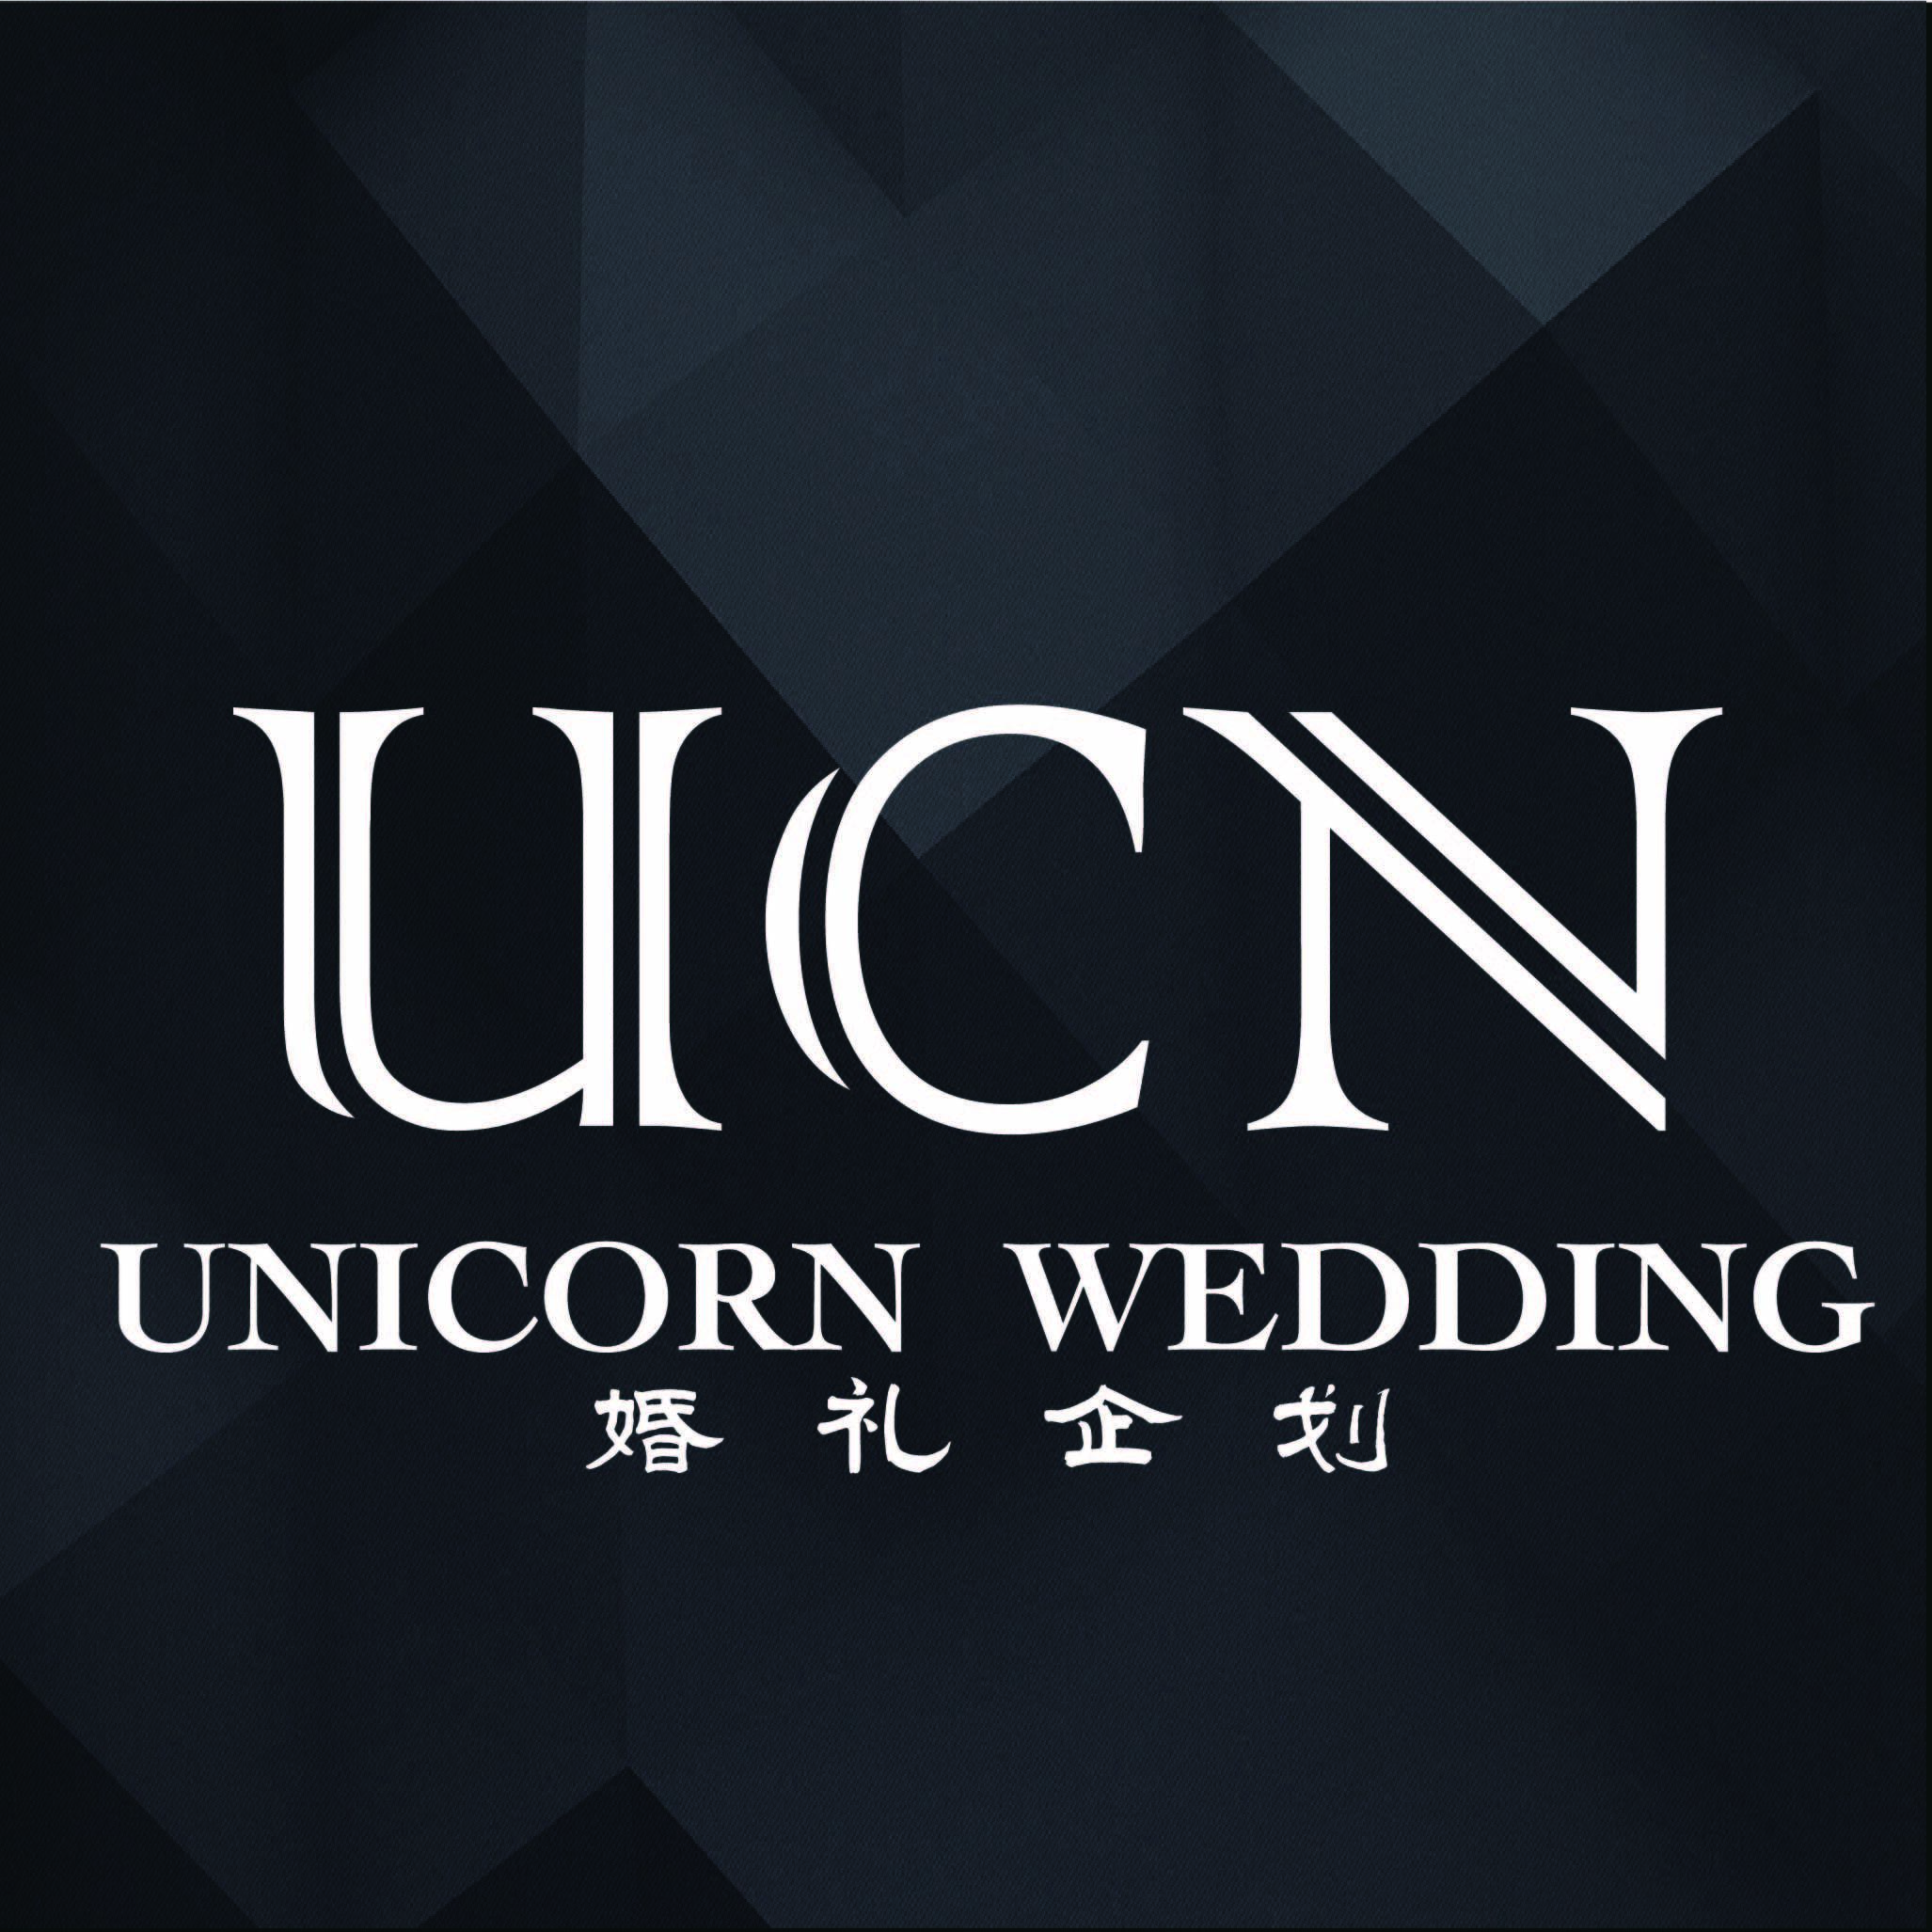 UCN婚礼企划